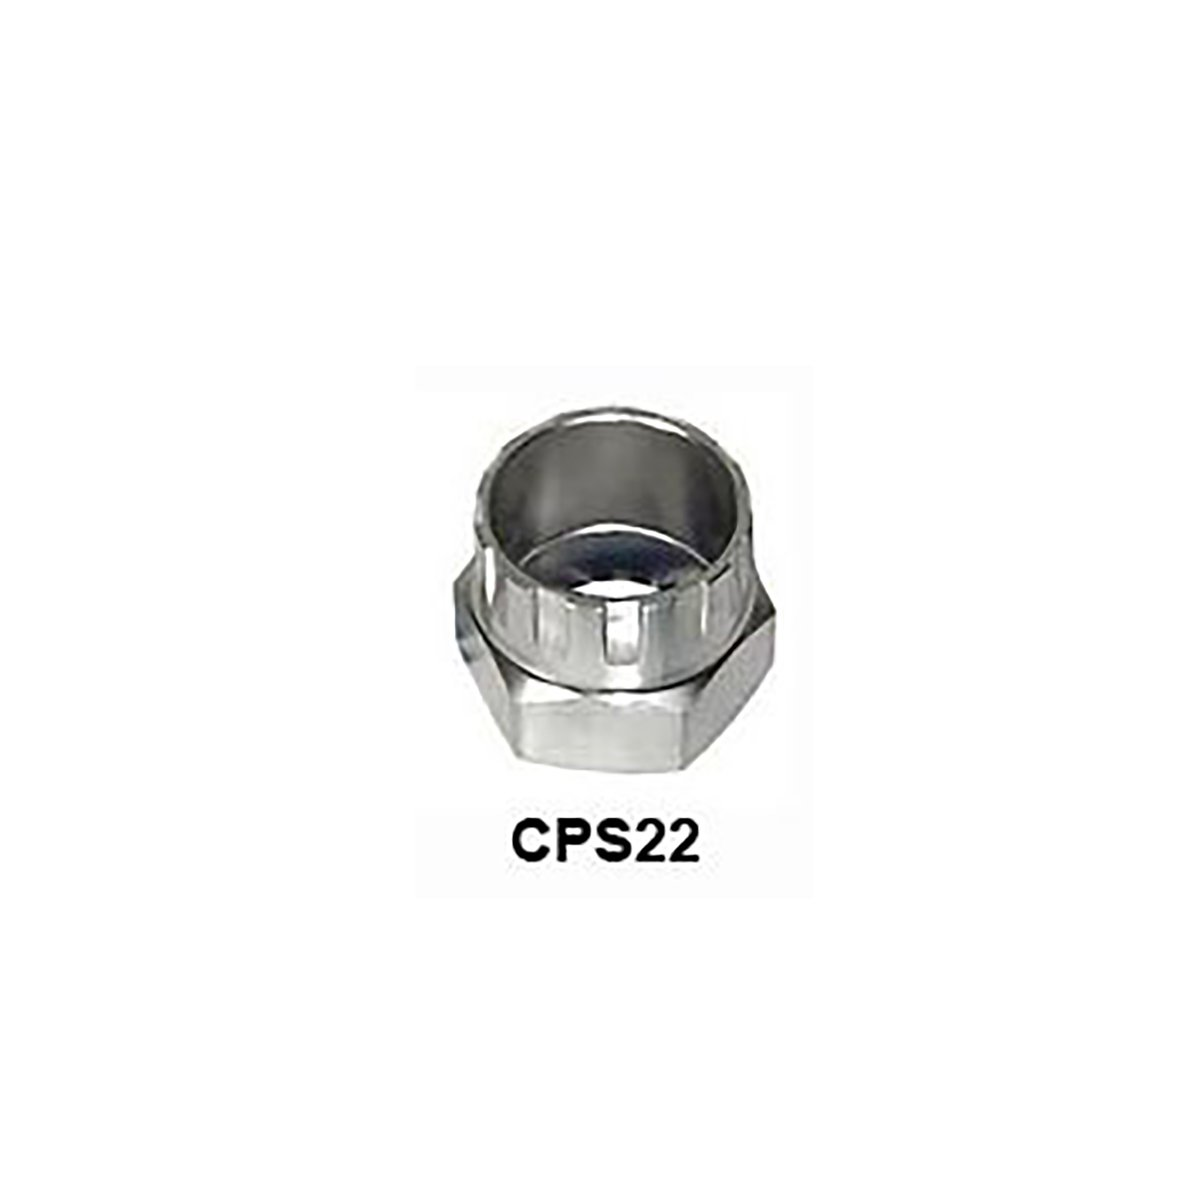 Campagnolo UT-BB080 Cassette Lockring & Bottom Bracket Tool